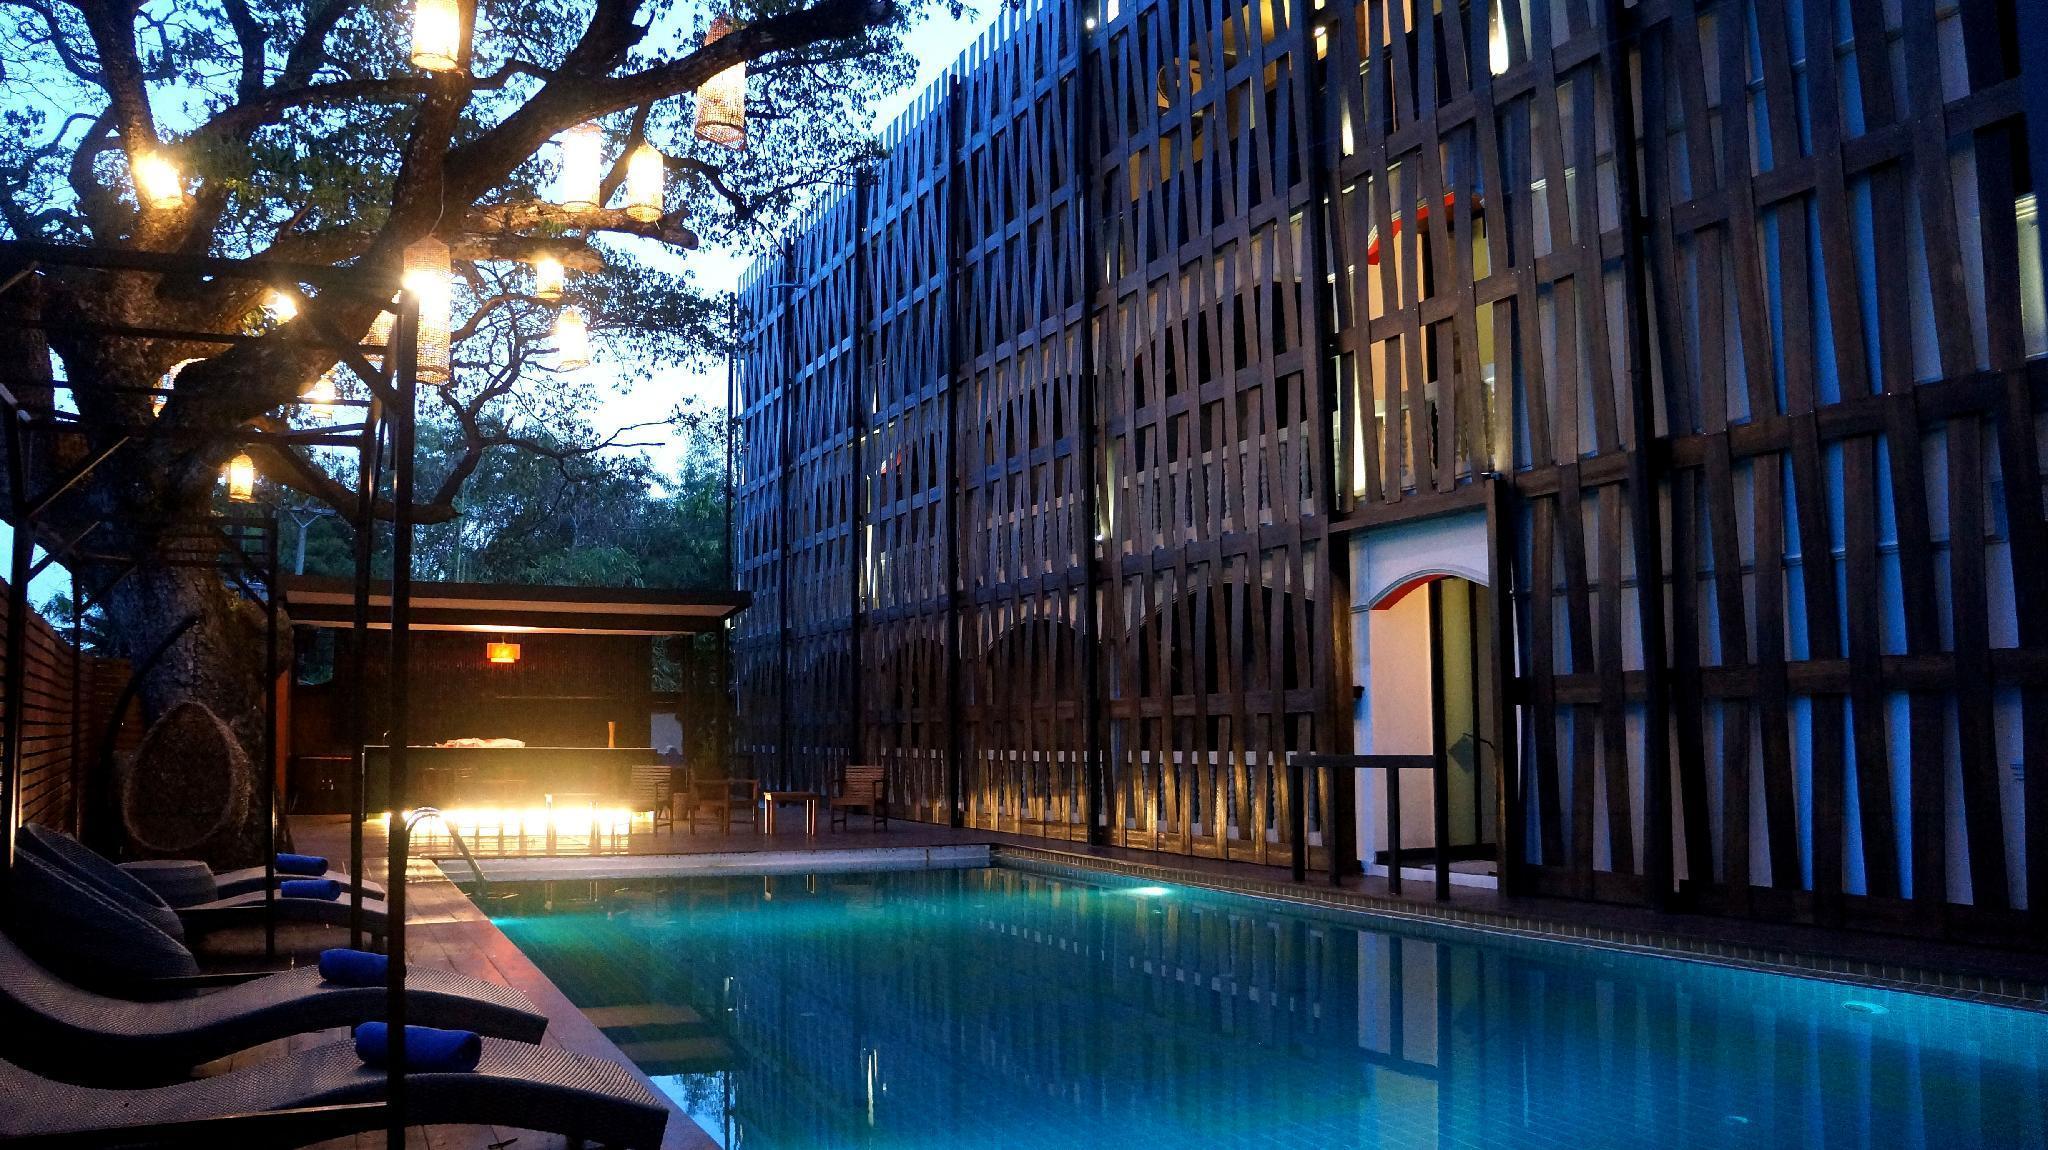 Bamboori Boutique Resort Chiang Mai แบมบูรี บูติค รีสอร์ท เชียงใหม่